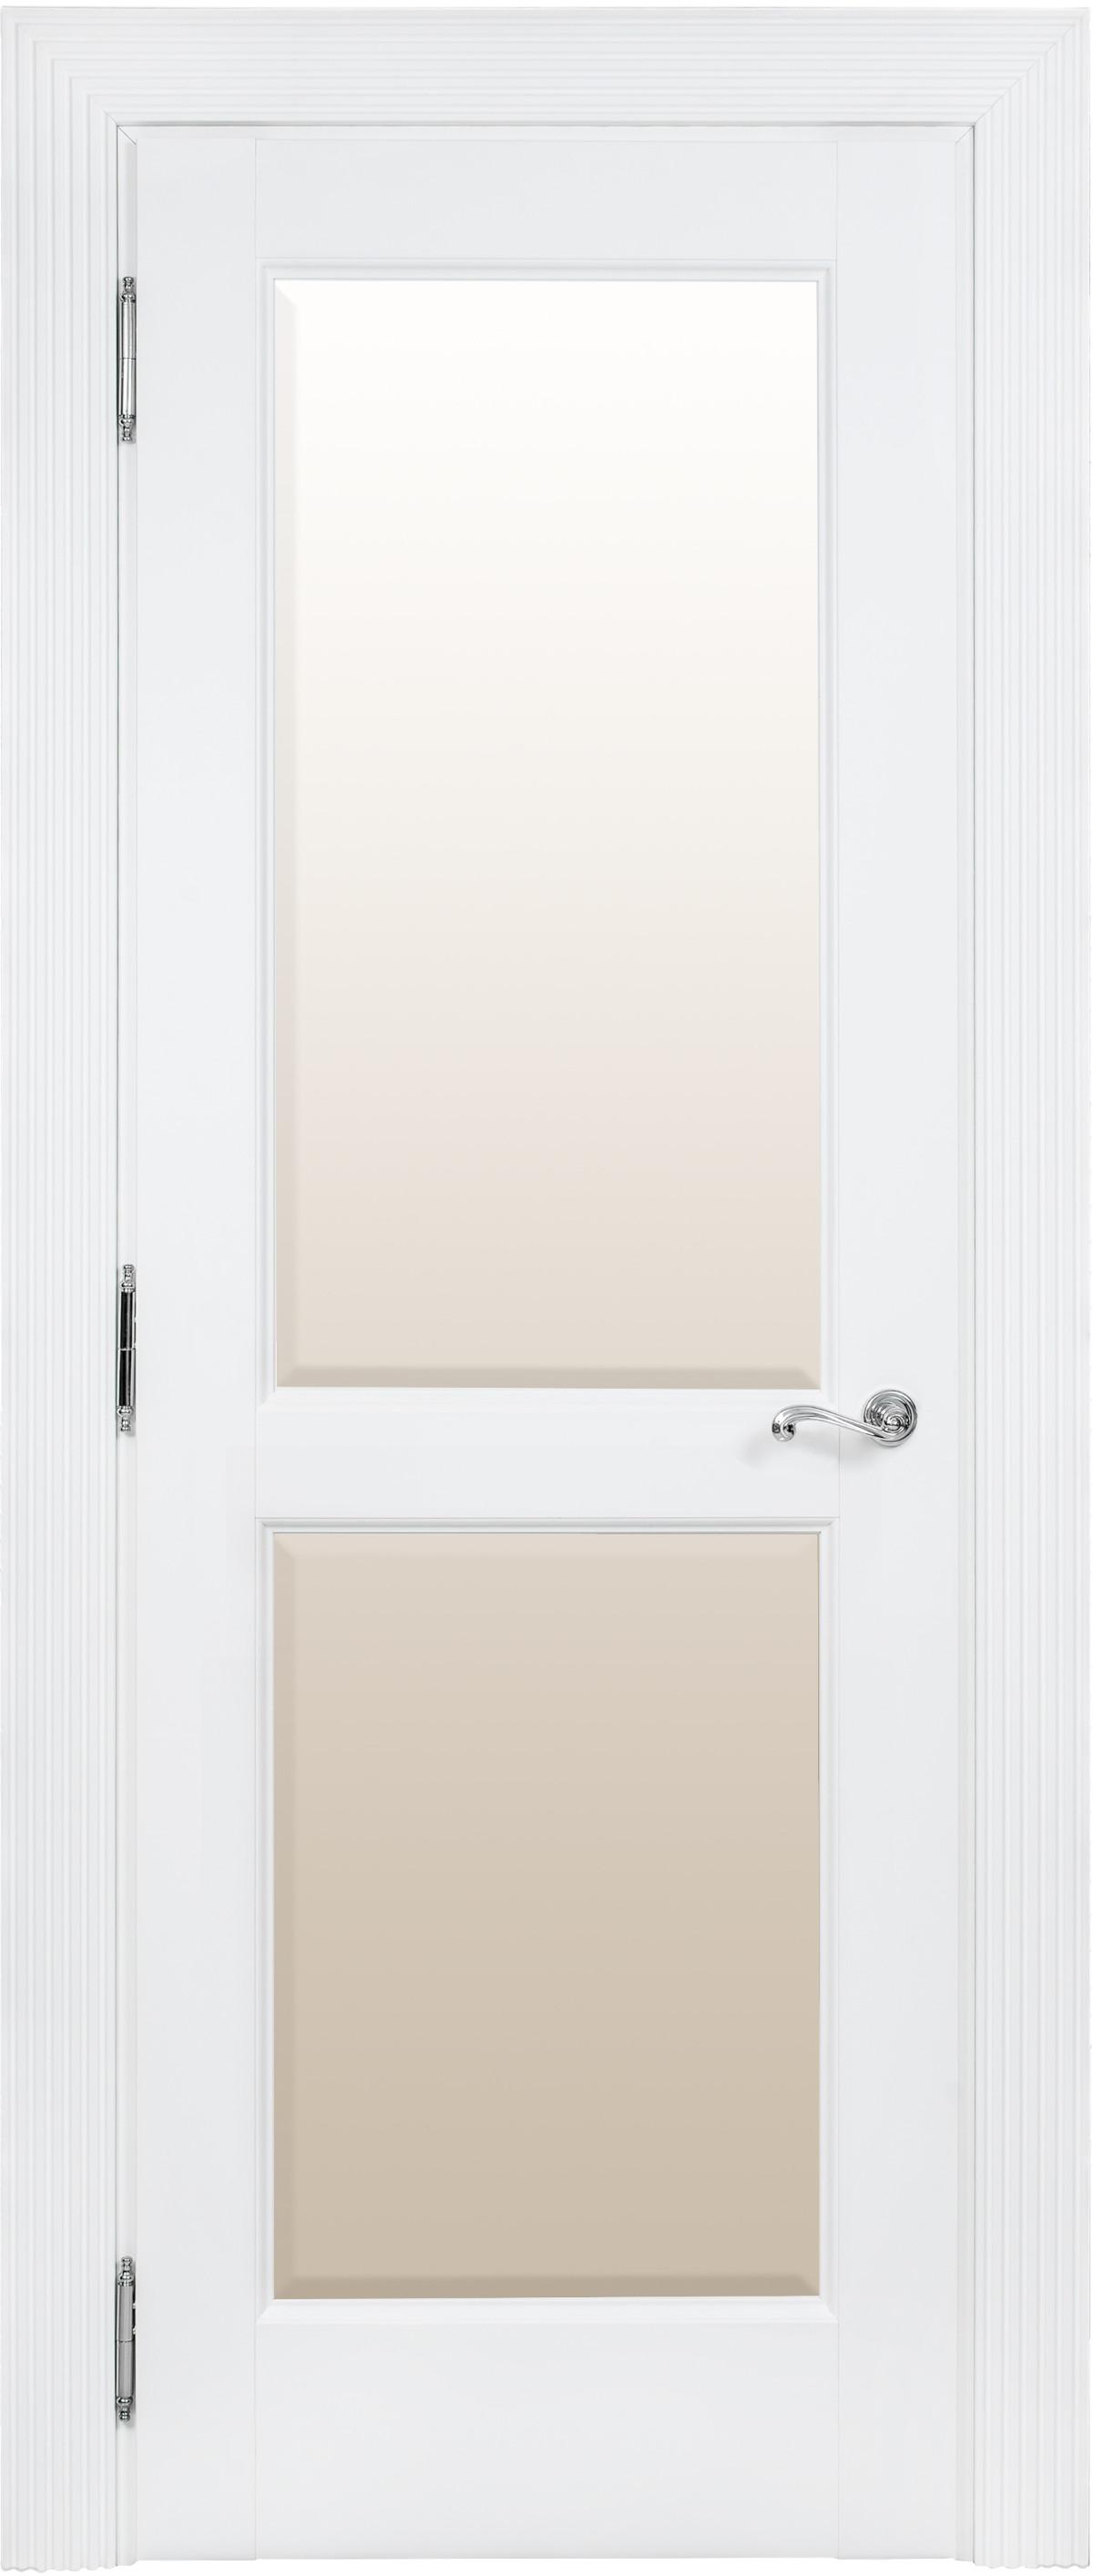 Белые межкомнатные двери со стеклом Academia 2S-2